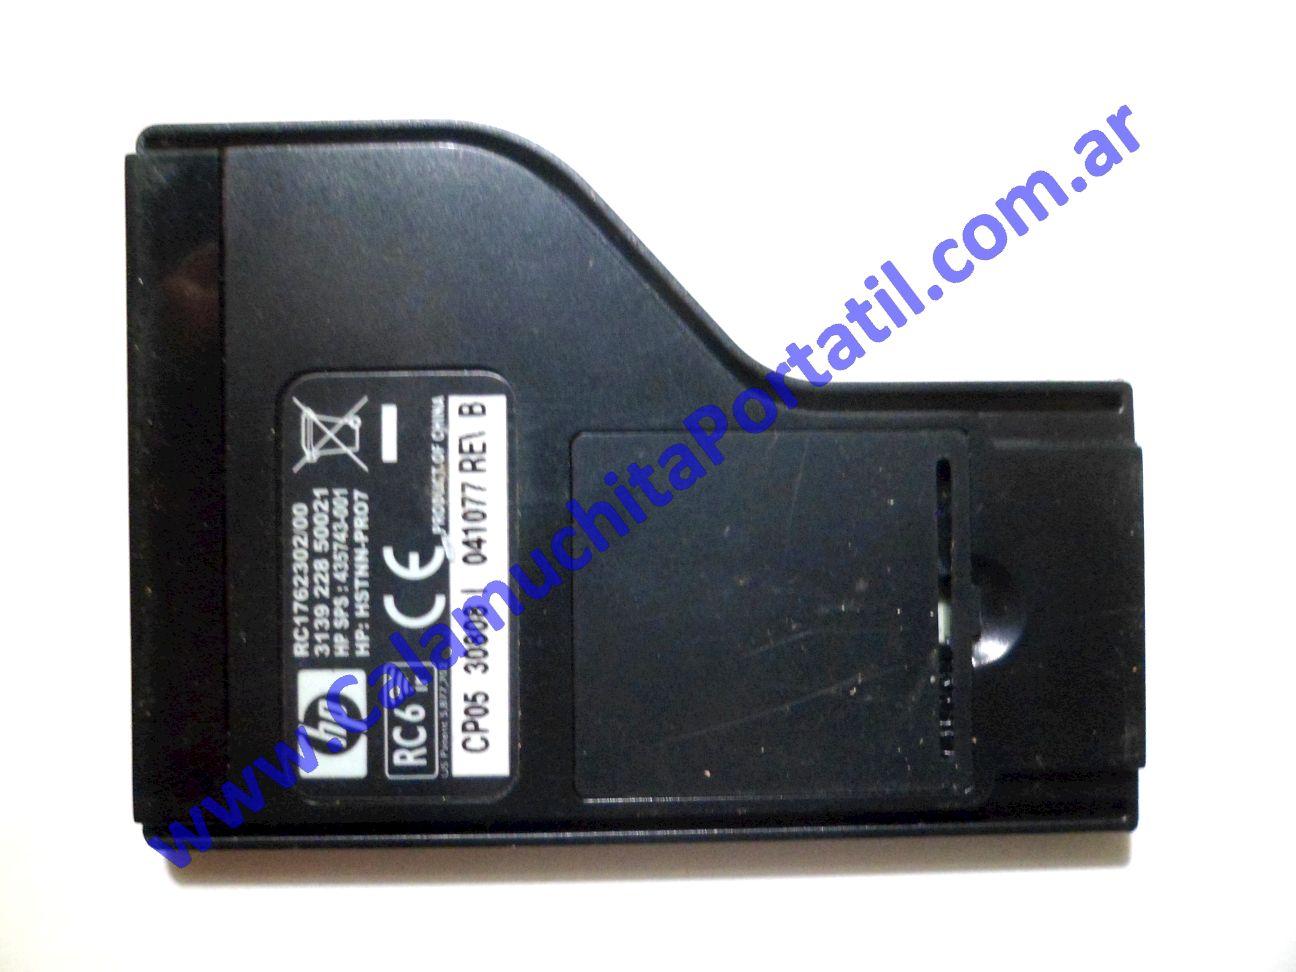 0201ACR Control Remoto Hewlett Packard Pavilion dv6000 / dv6815nr